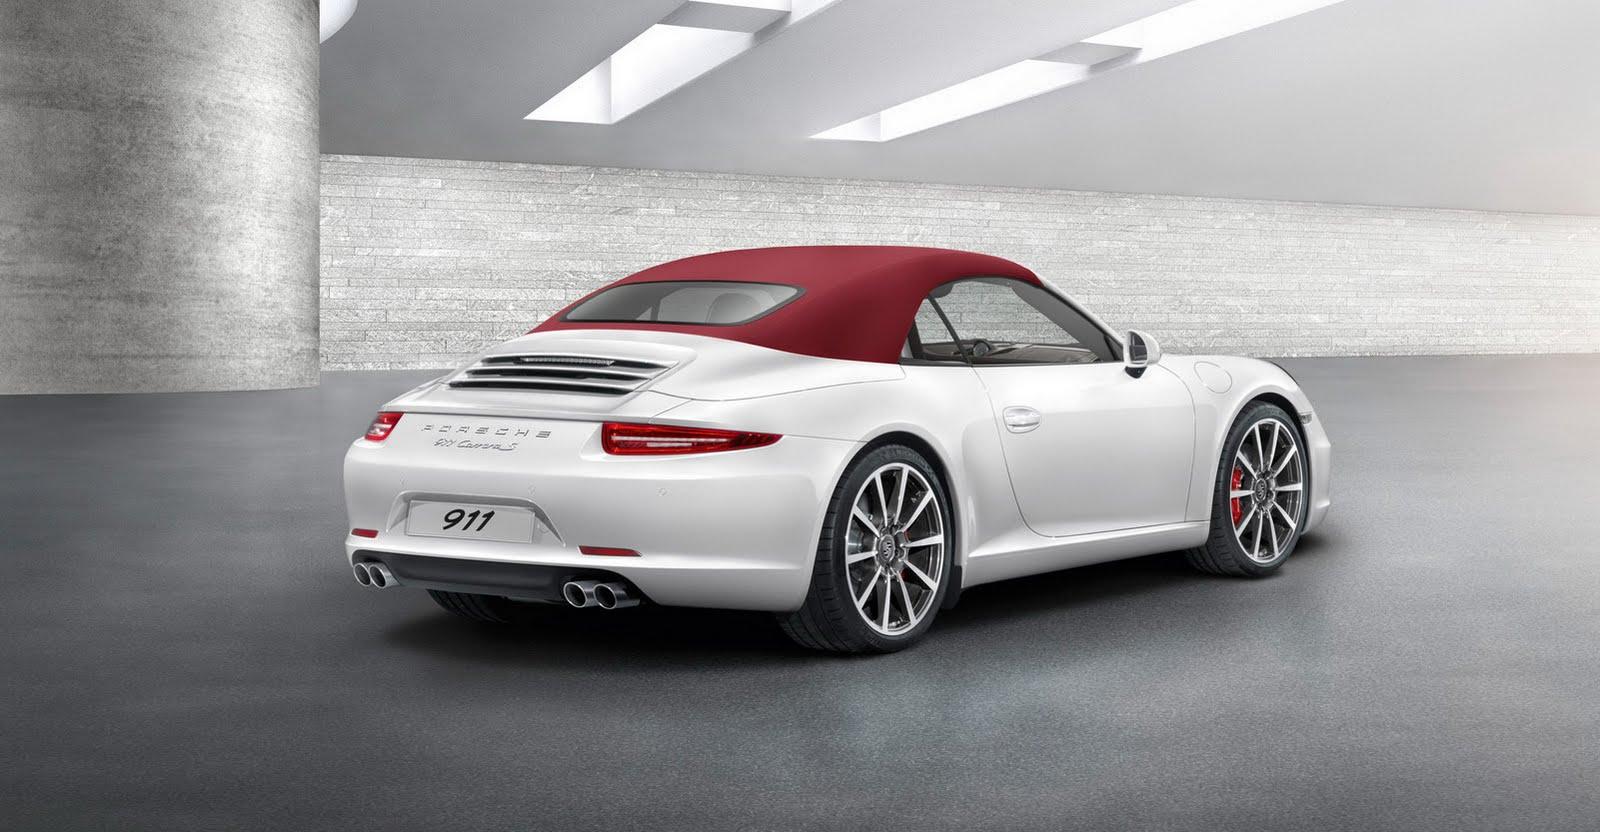 Porsche-Cabriolet-Desktop-Wallpaper-wallpaper-wp4803075